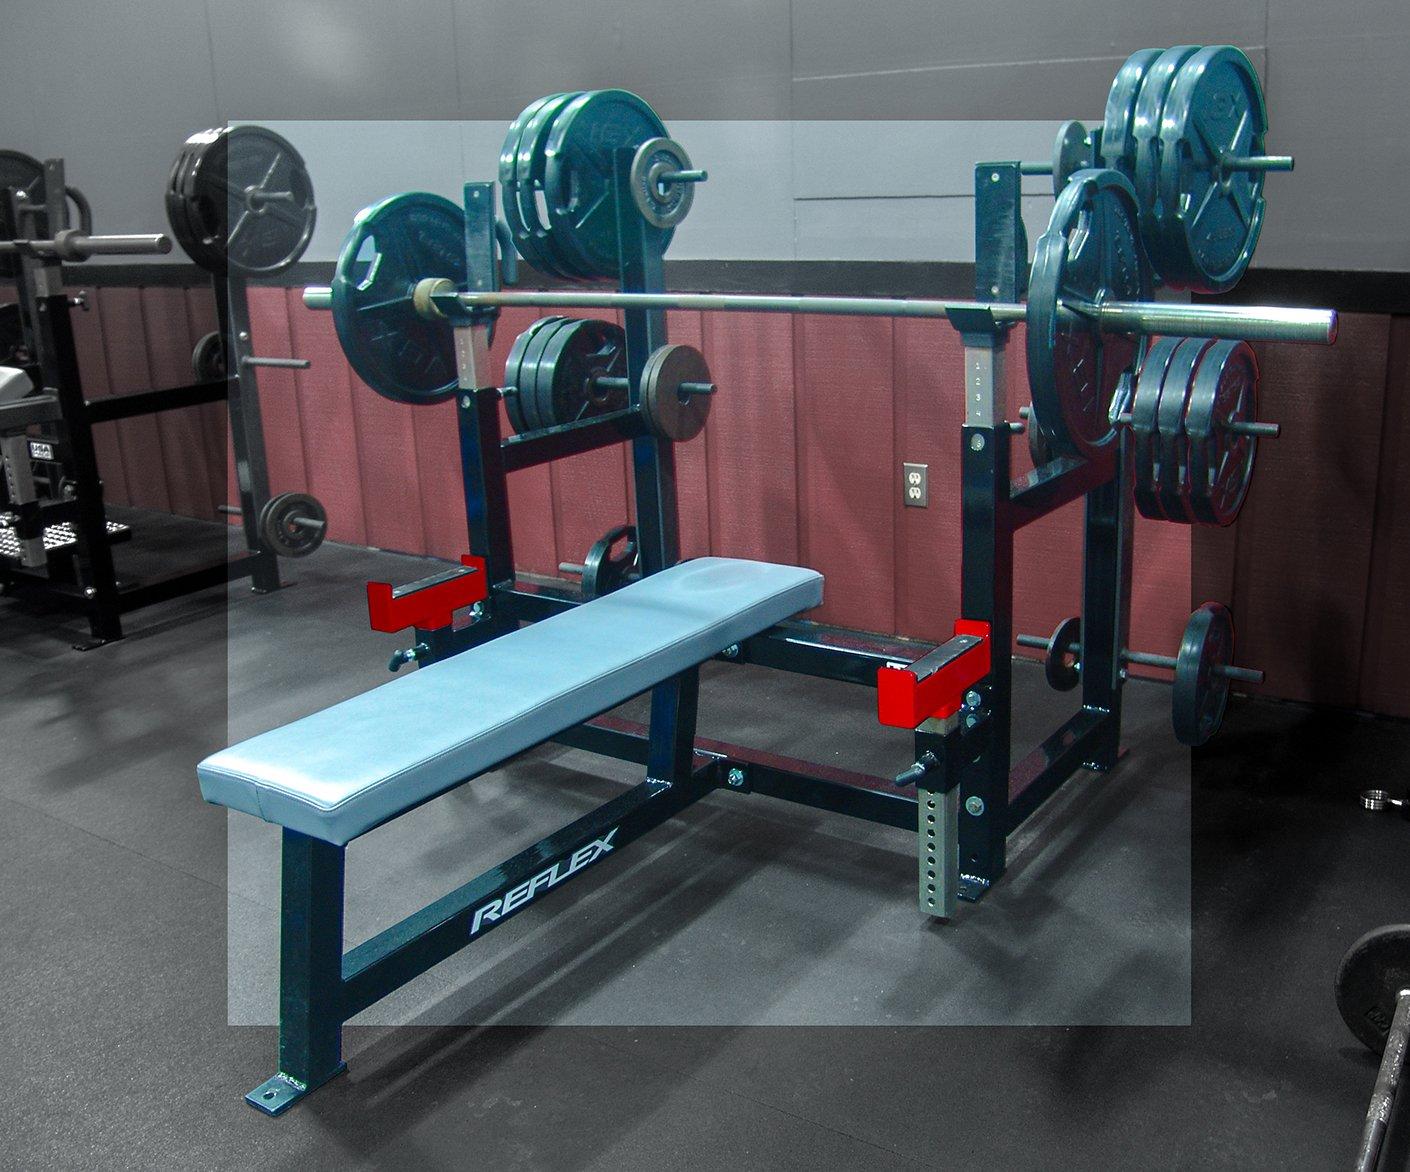 Reflex flat bench